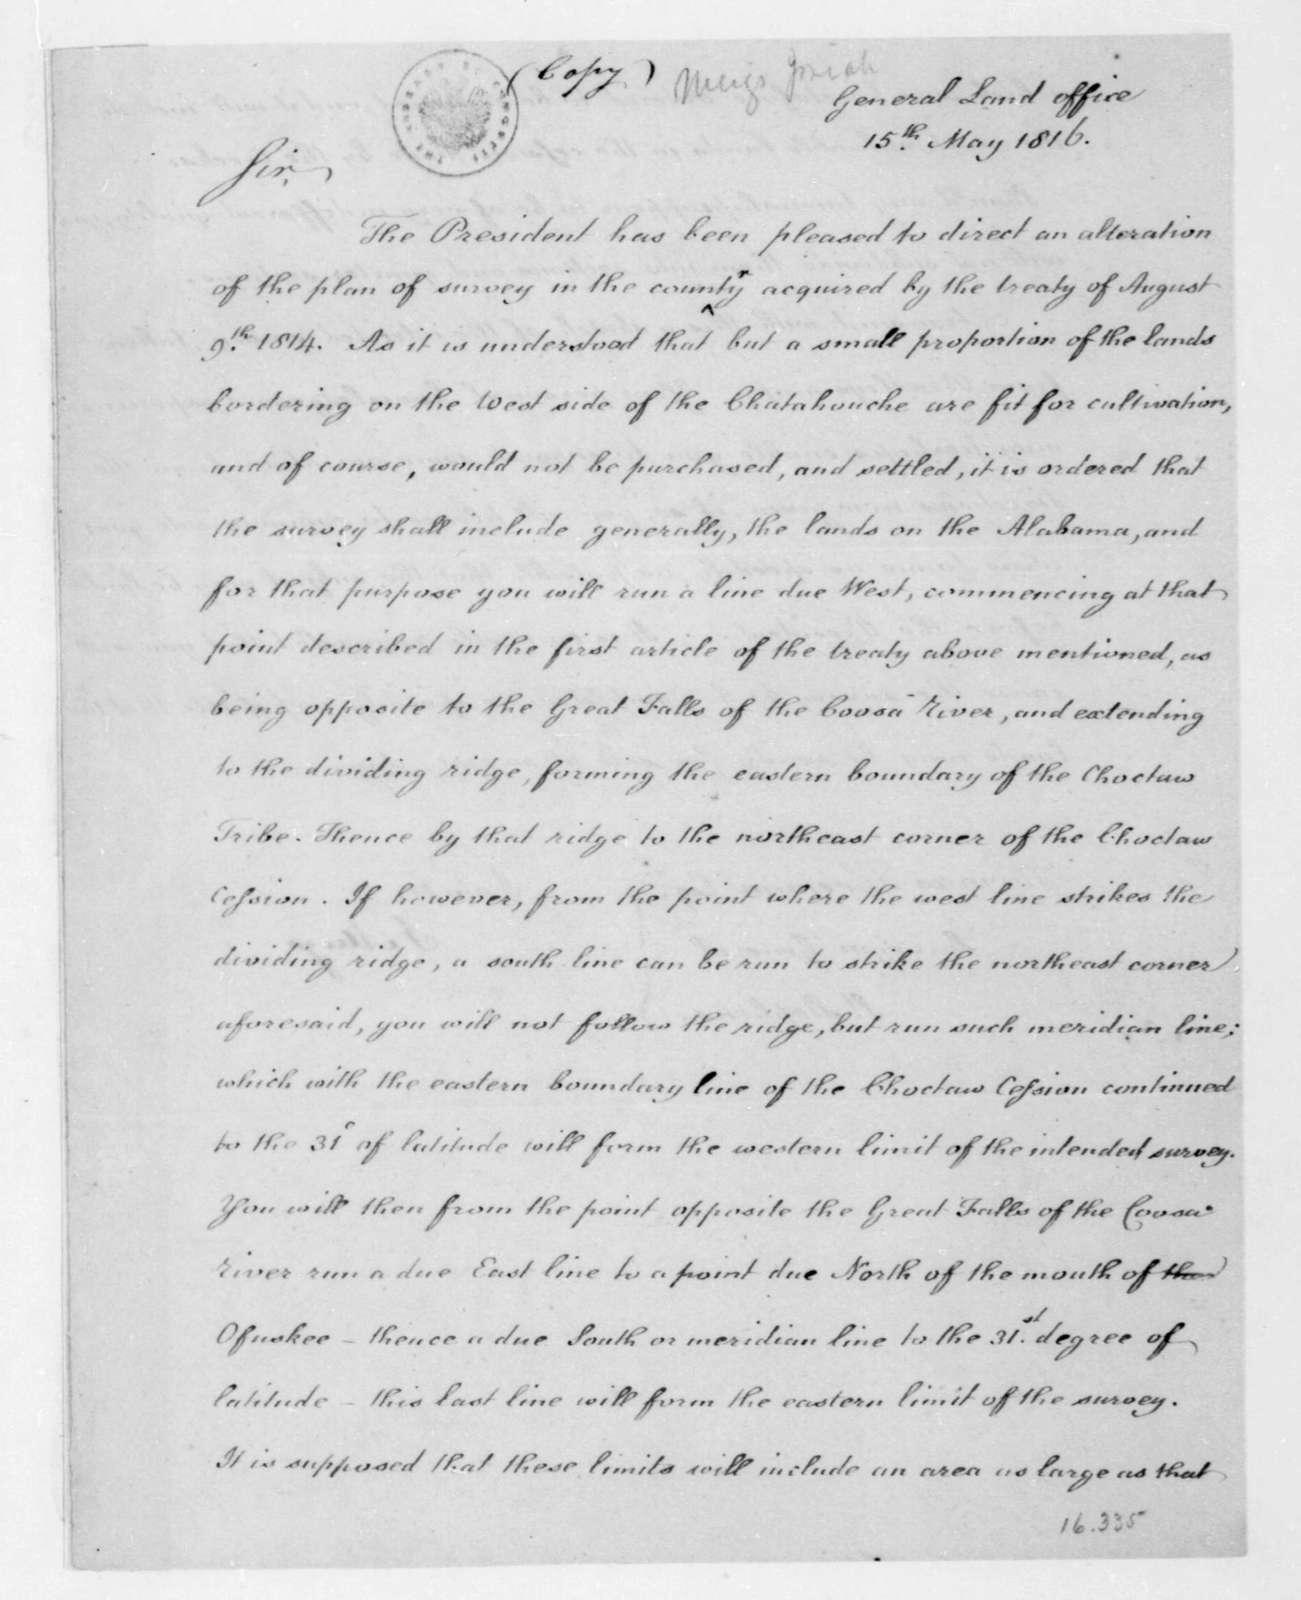 Josiah Meigs to Thomas Freeman, May 15, 1816.